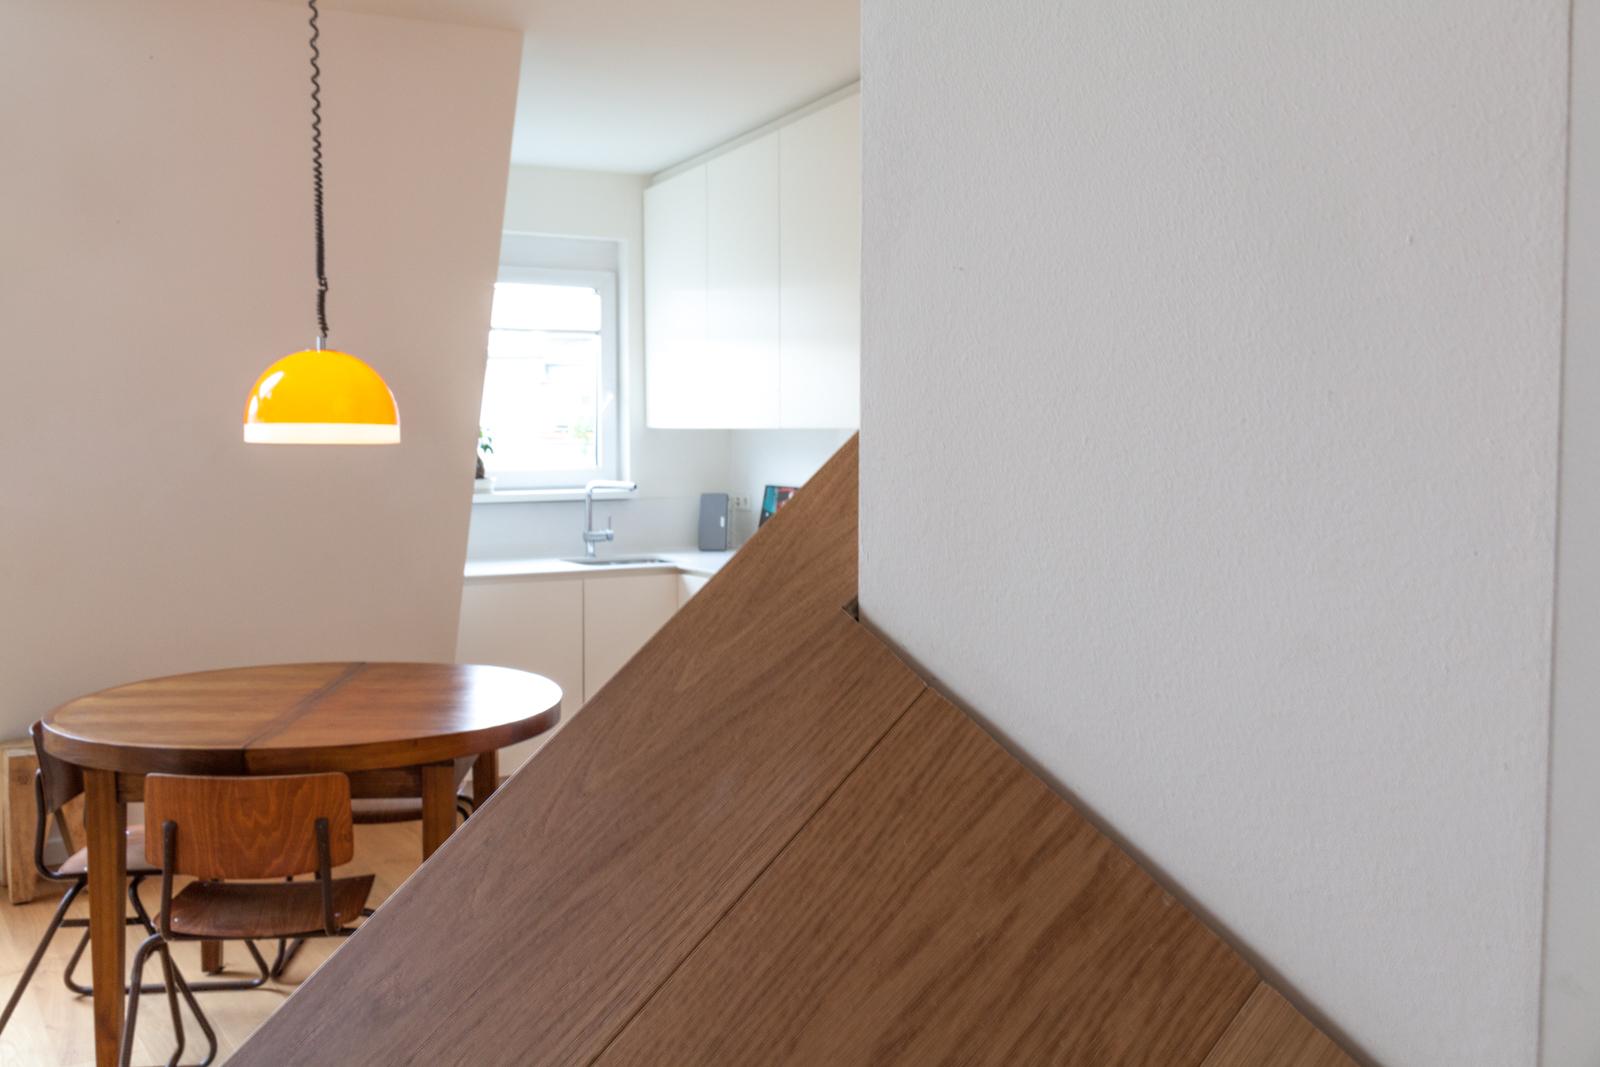 Kitchen Livingroom Interior by Luca Lancini